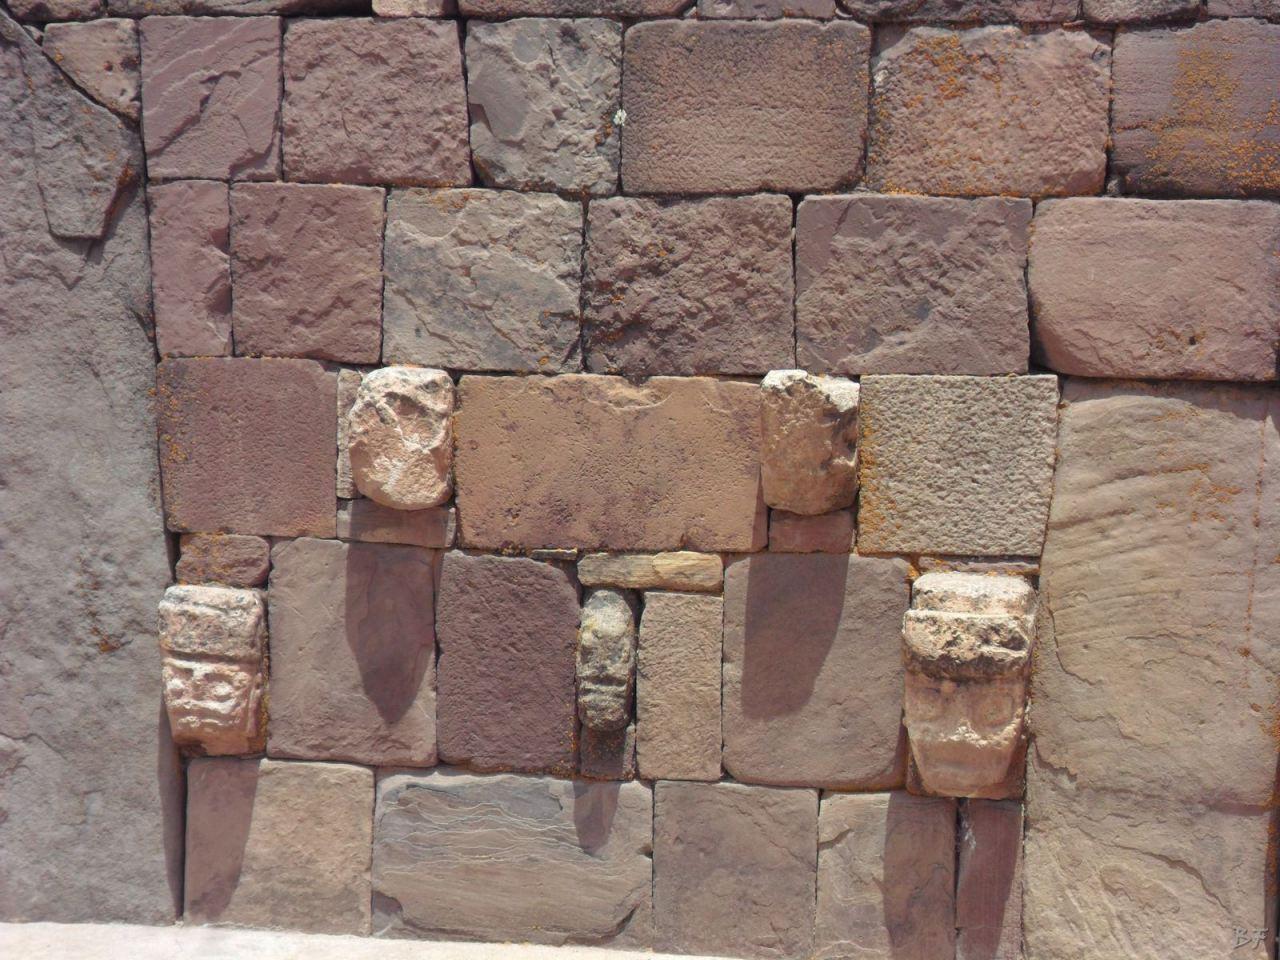 Sito-Megalitico-Piramide-Akapana-Kalasasaya-Menhir-Tiahuanaco-Bolivia-85